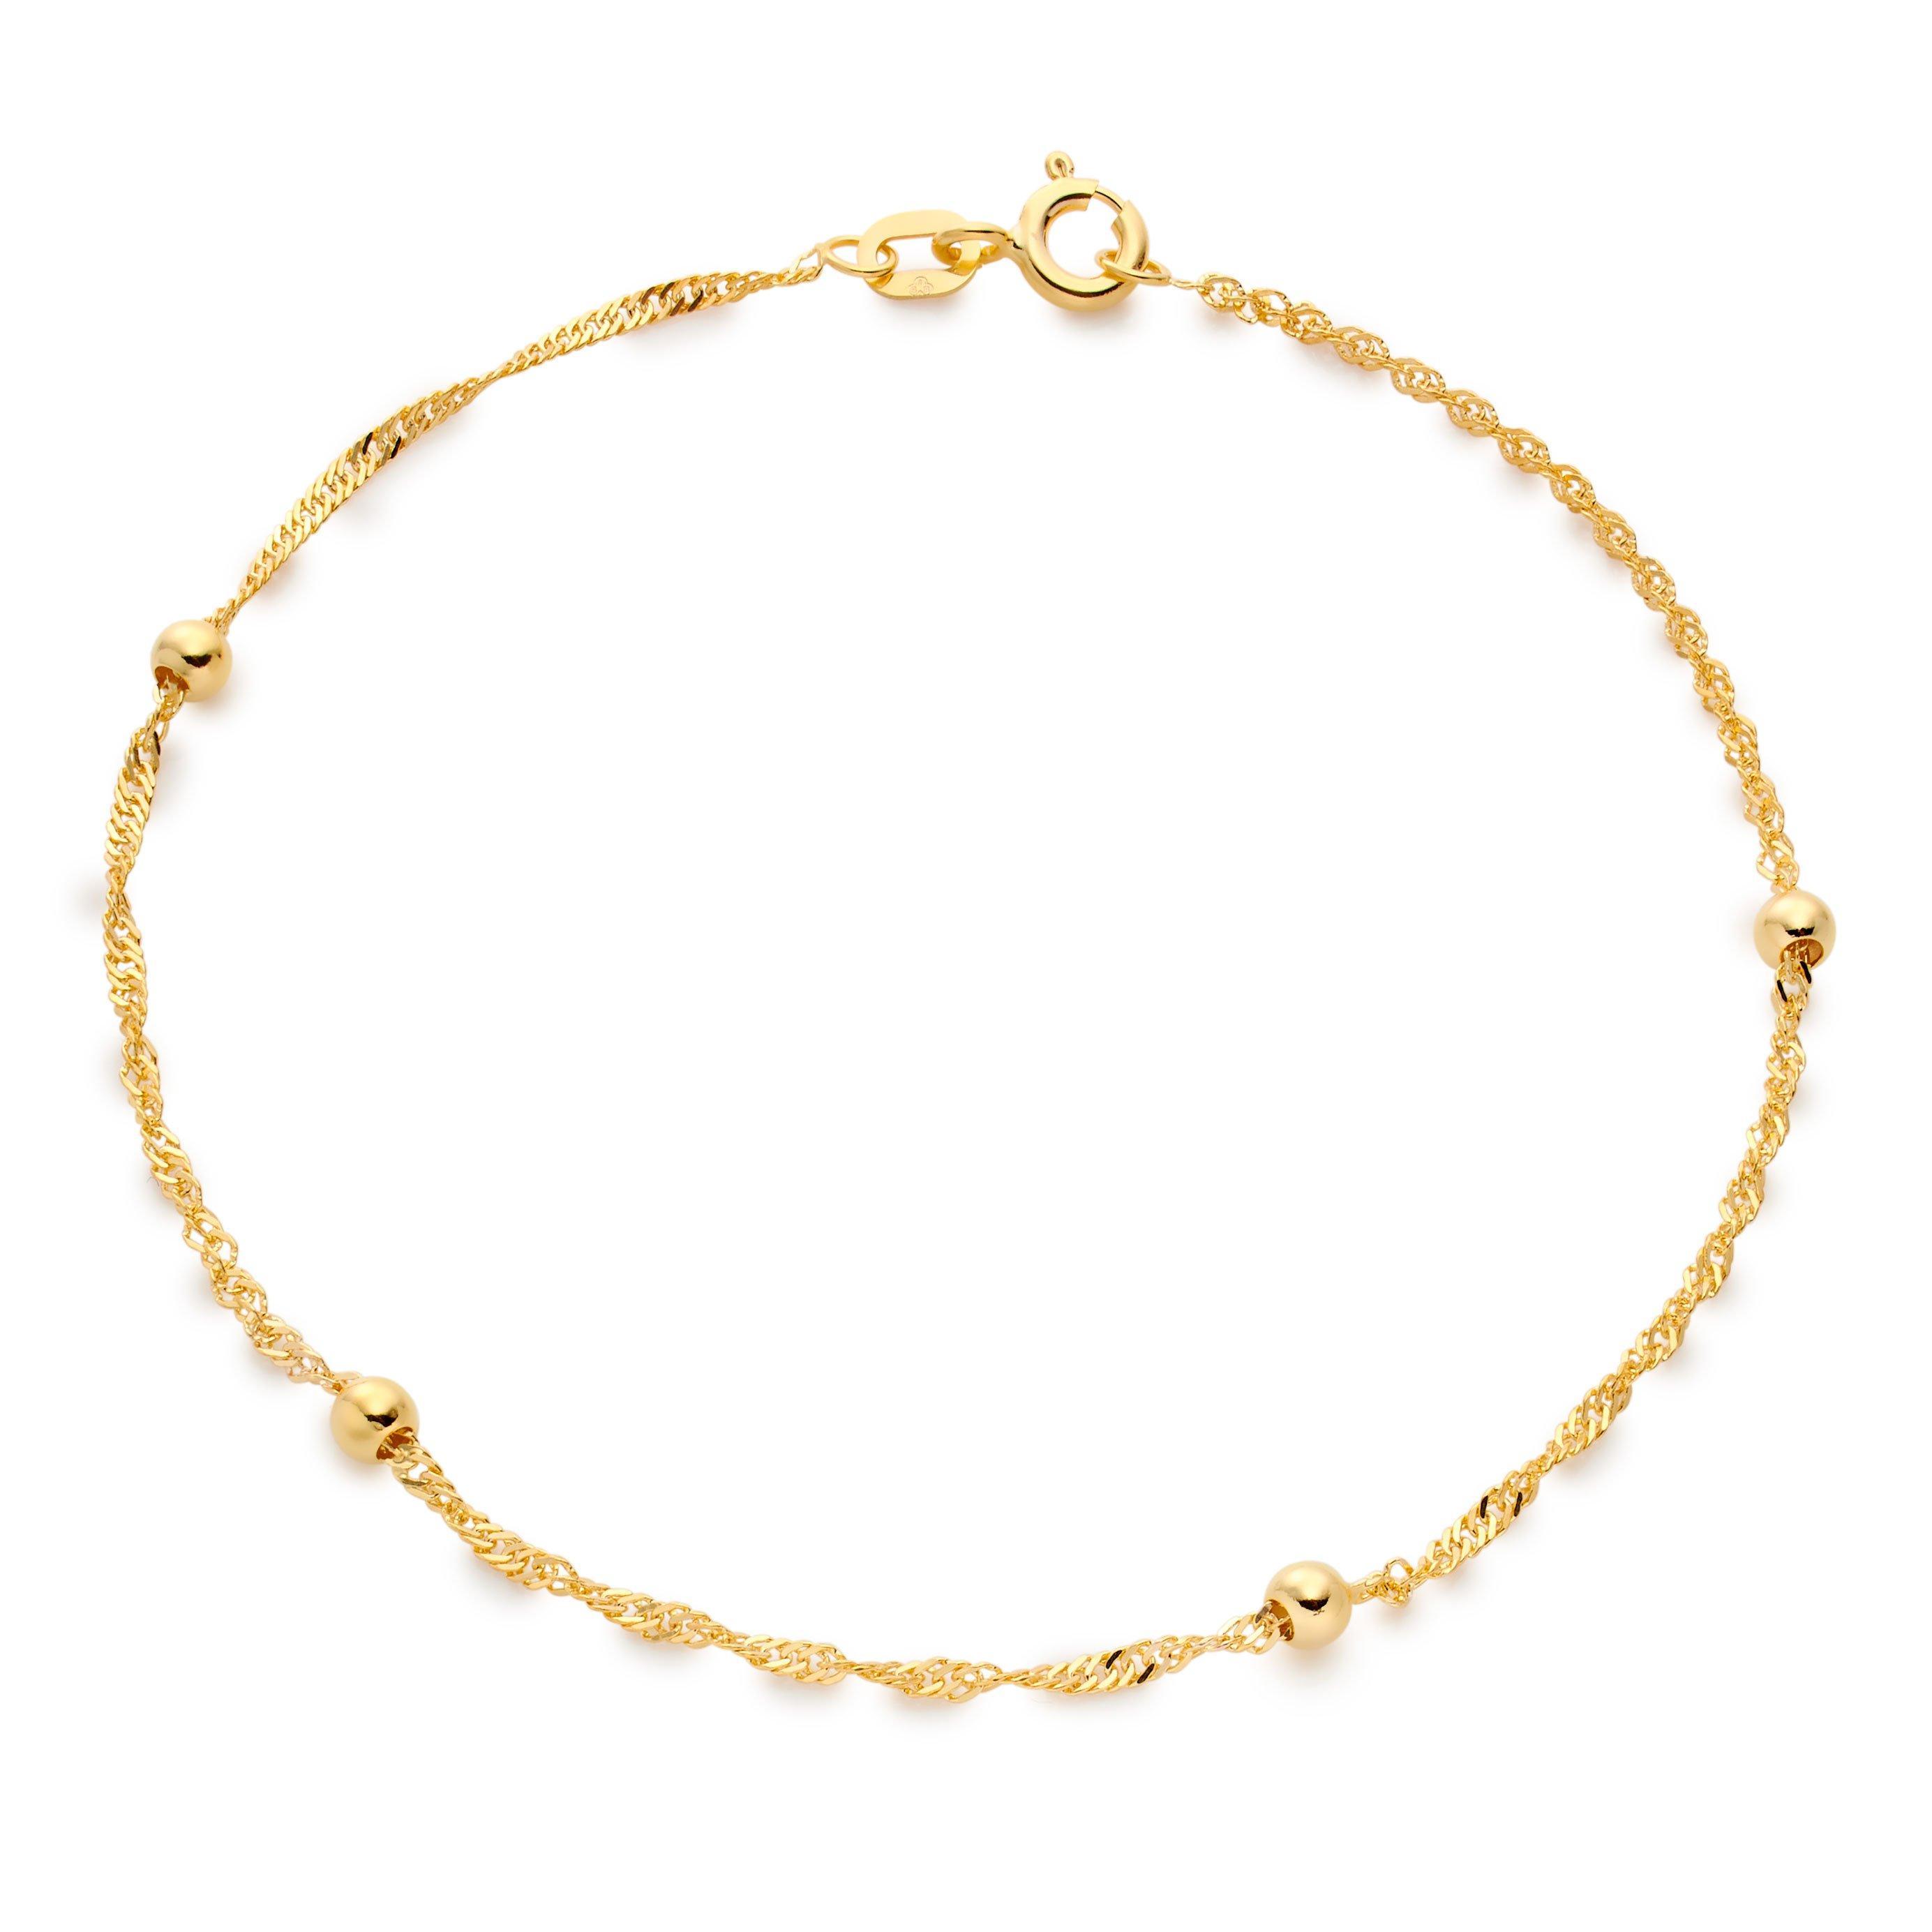 9ct Gold Bead Bracelet